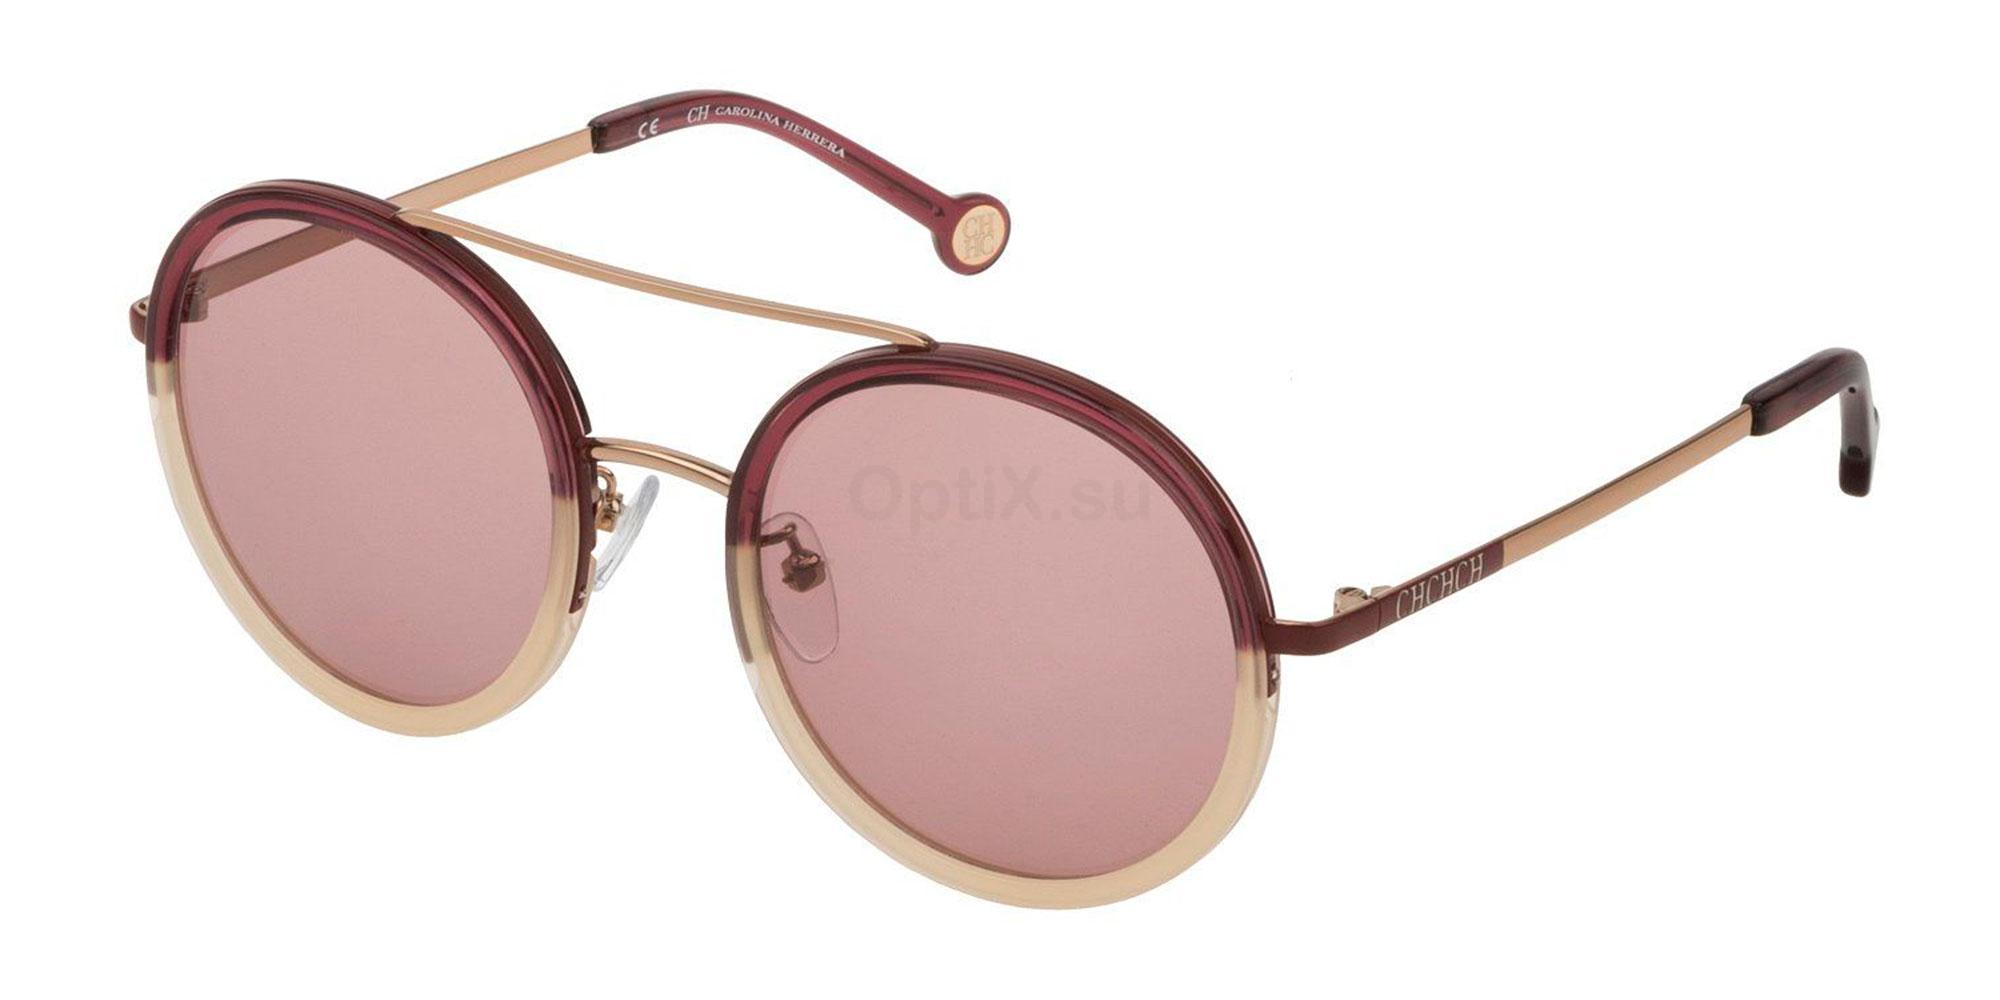 08MD SHE121 Sunglasses, CH Carolina Herrera